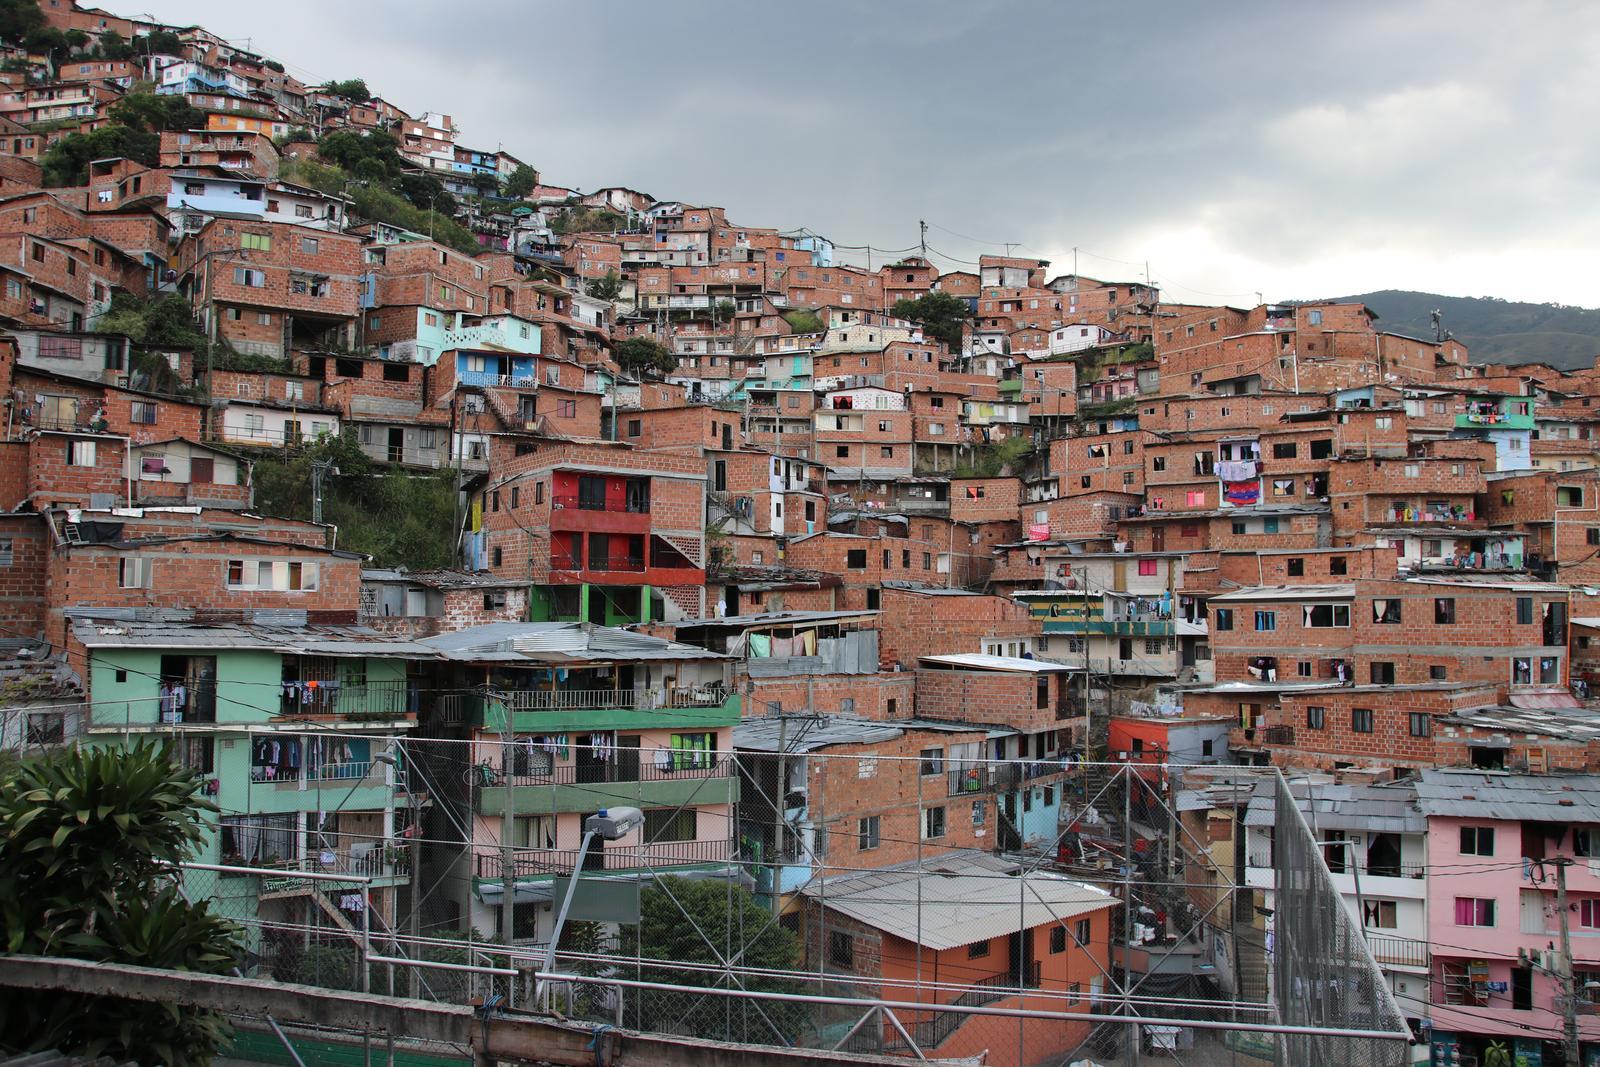 Guerra contra las drogas Favela